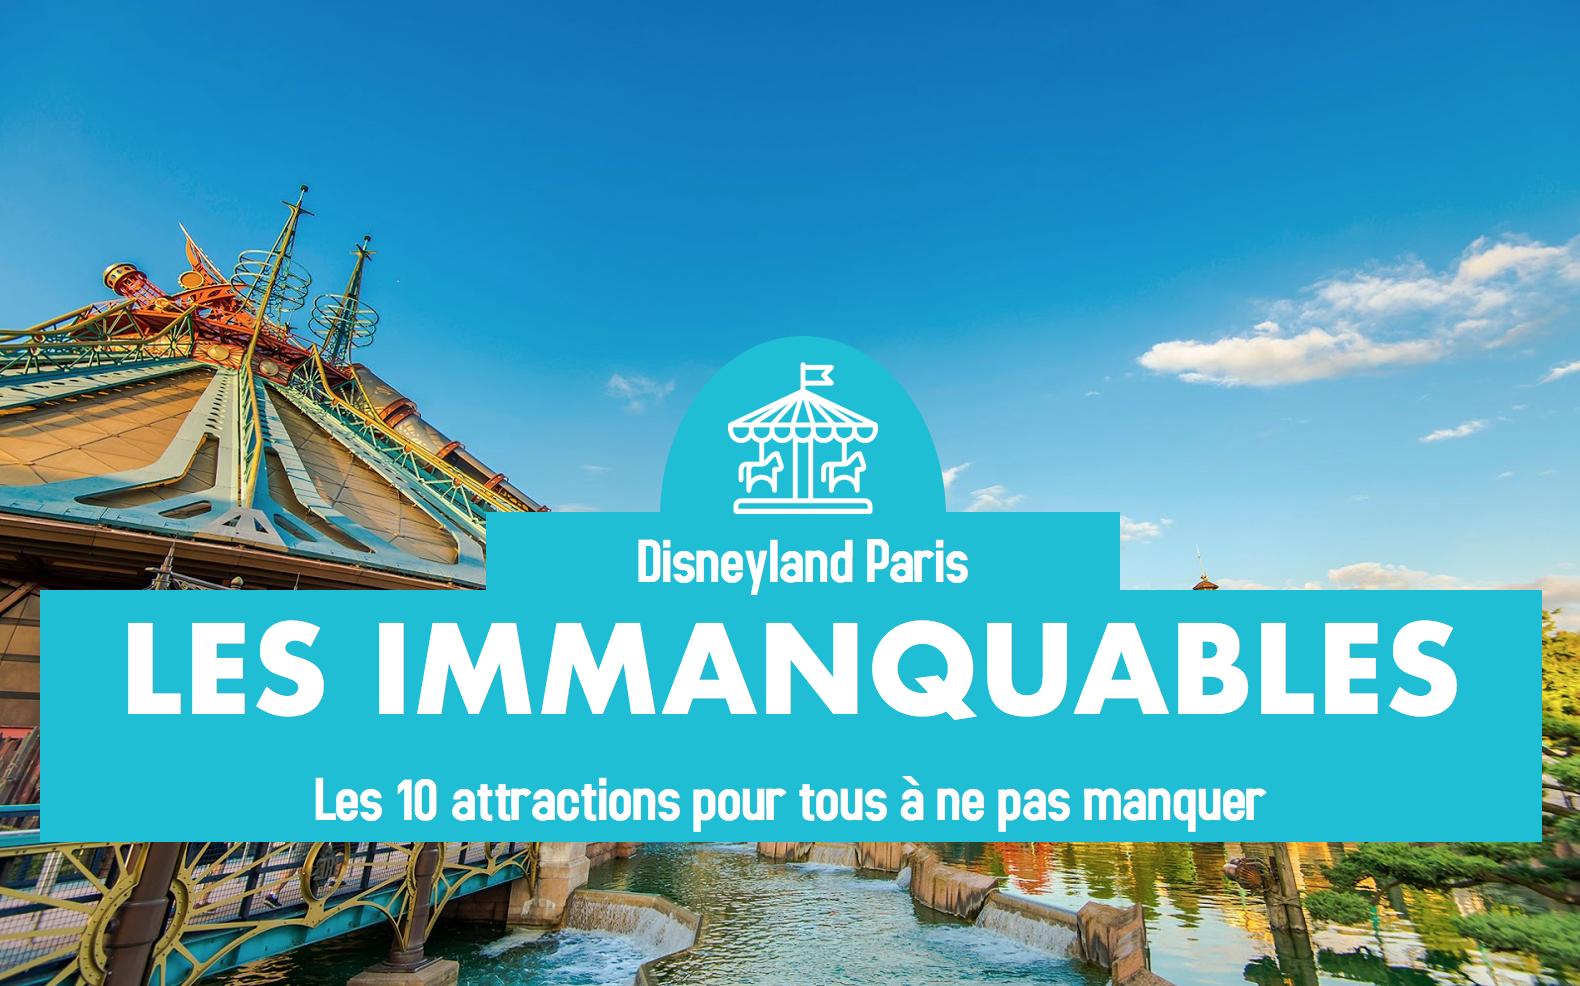 nom-des-attraction-disneyland-paris - Photos